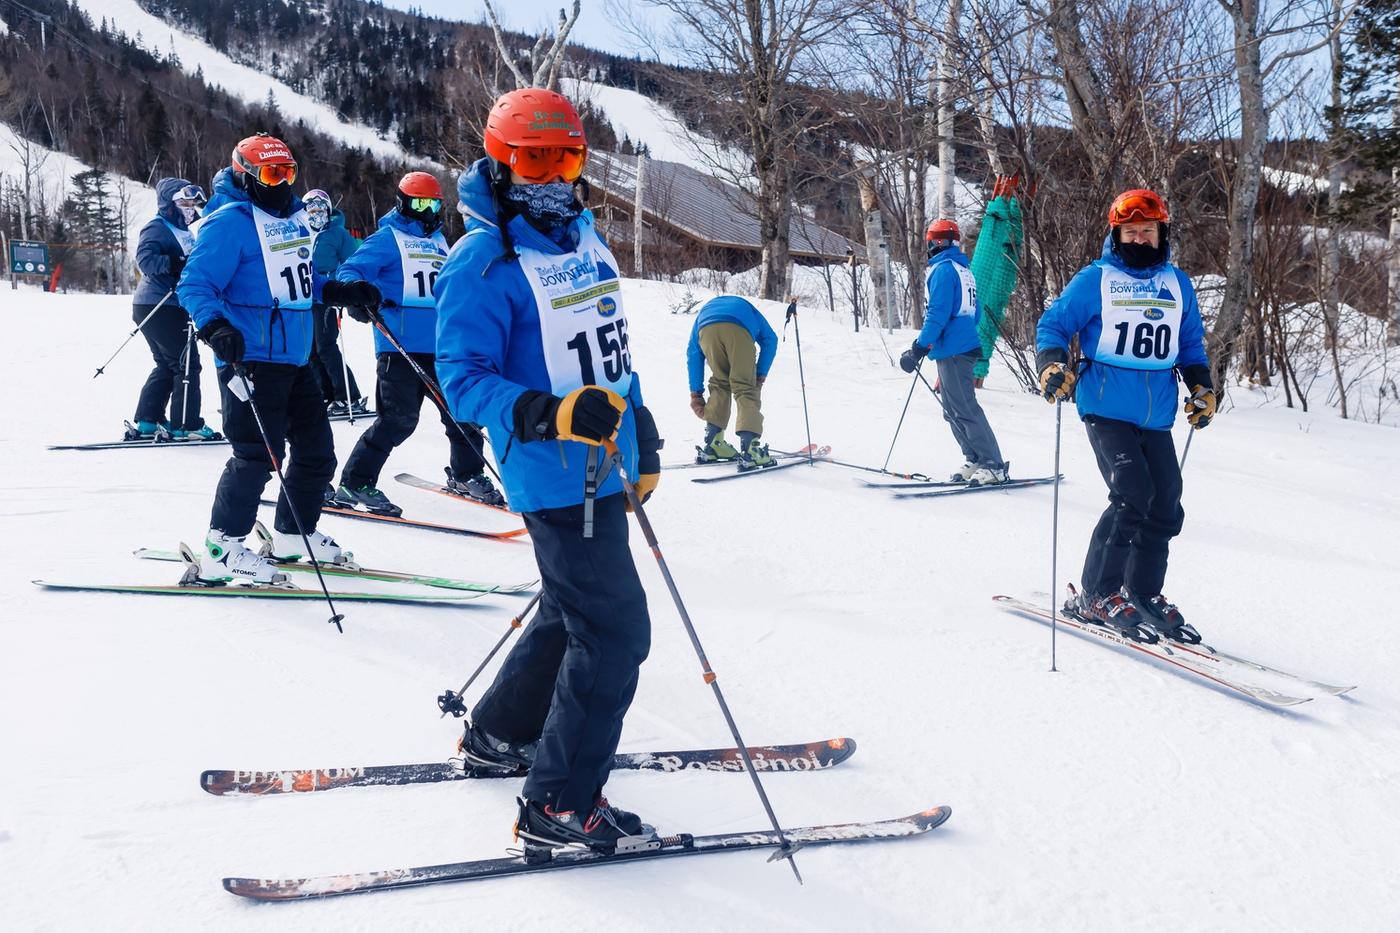 WinterKids Downhill 24 2021 SDP 3288